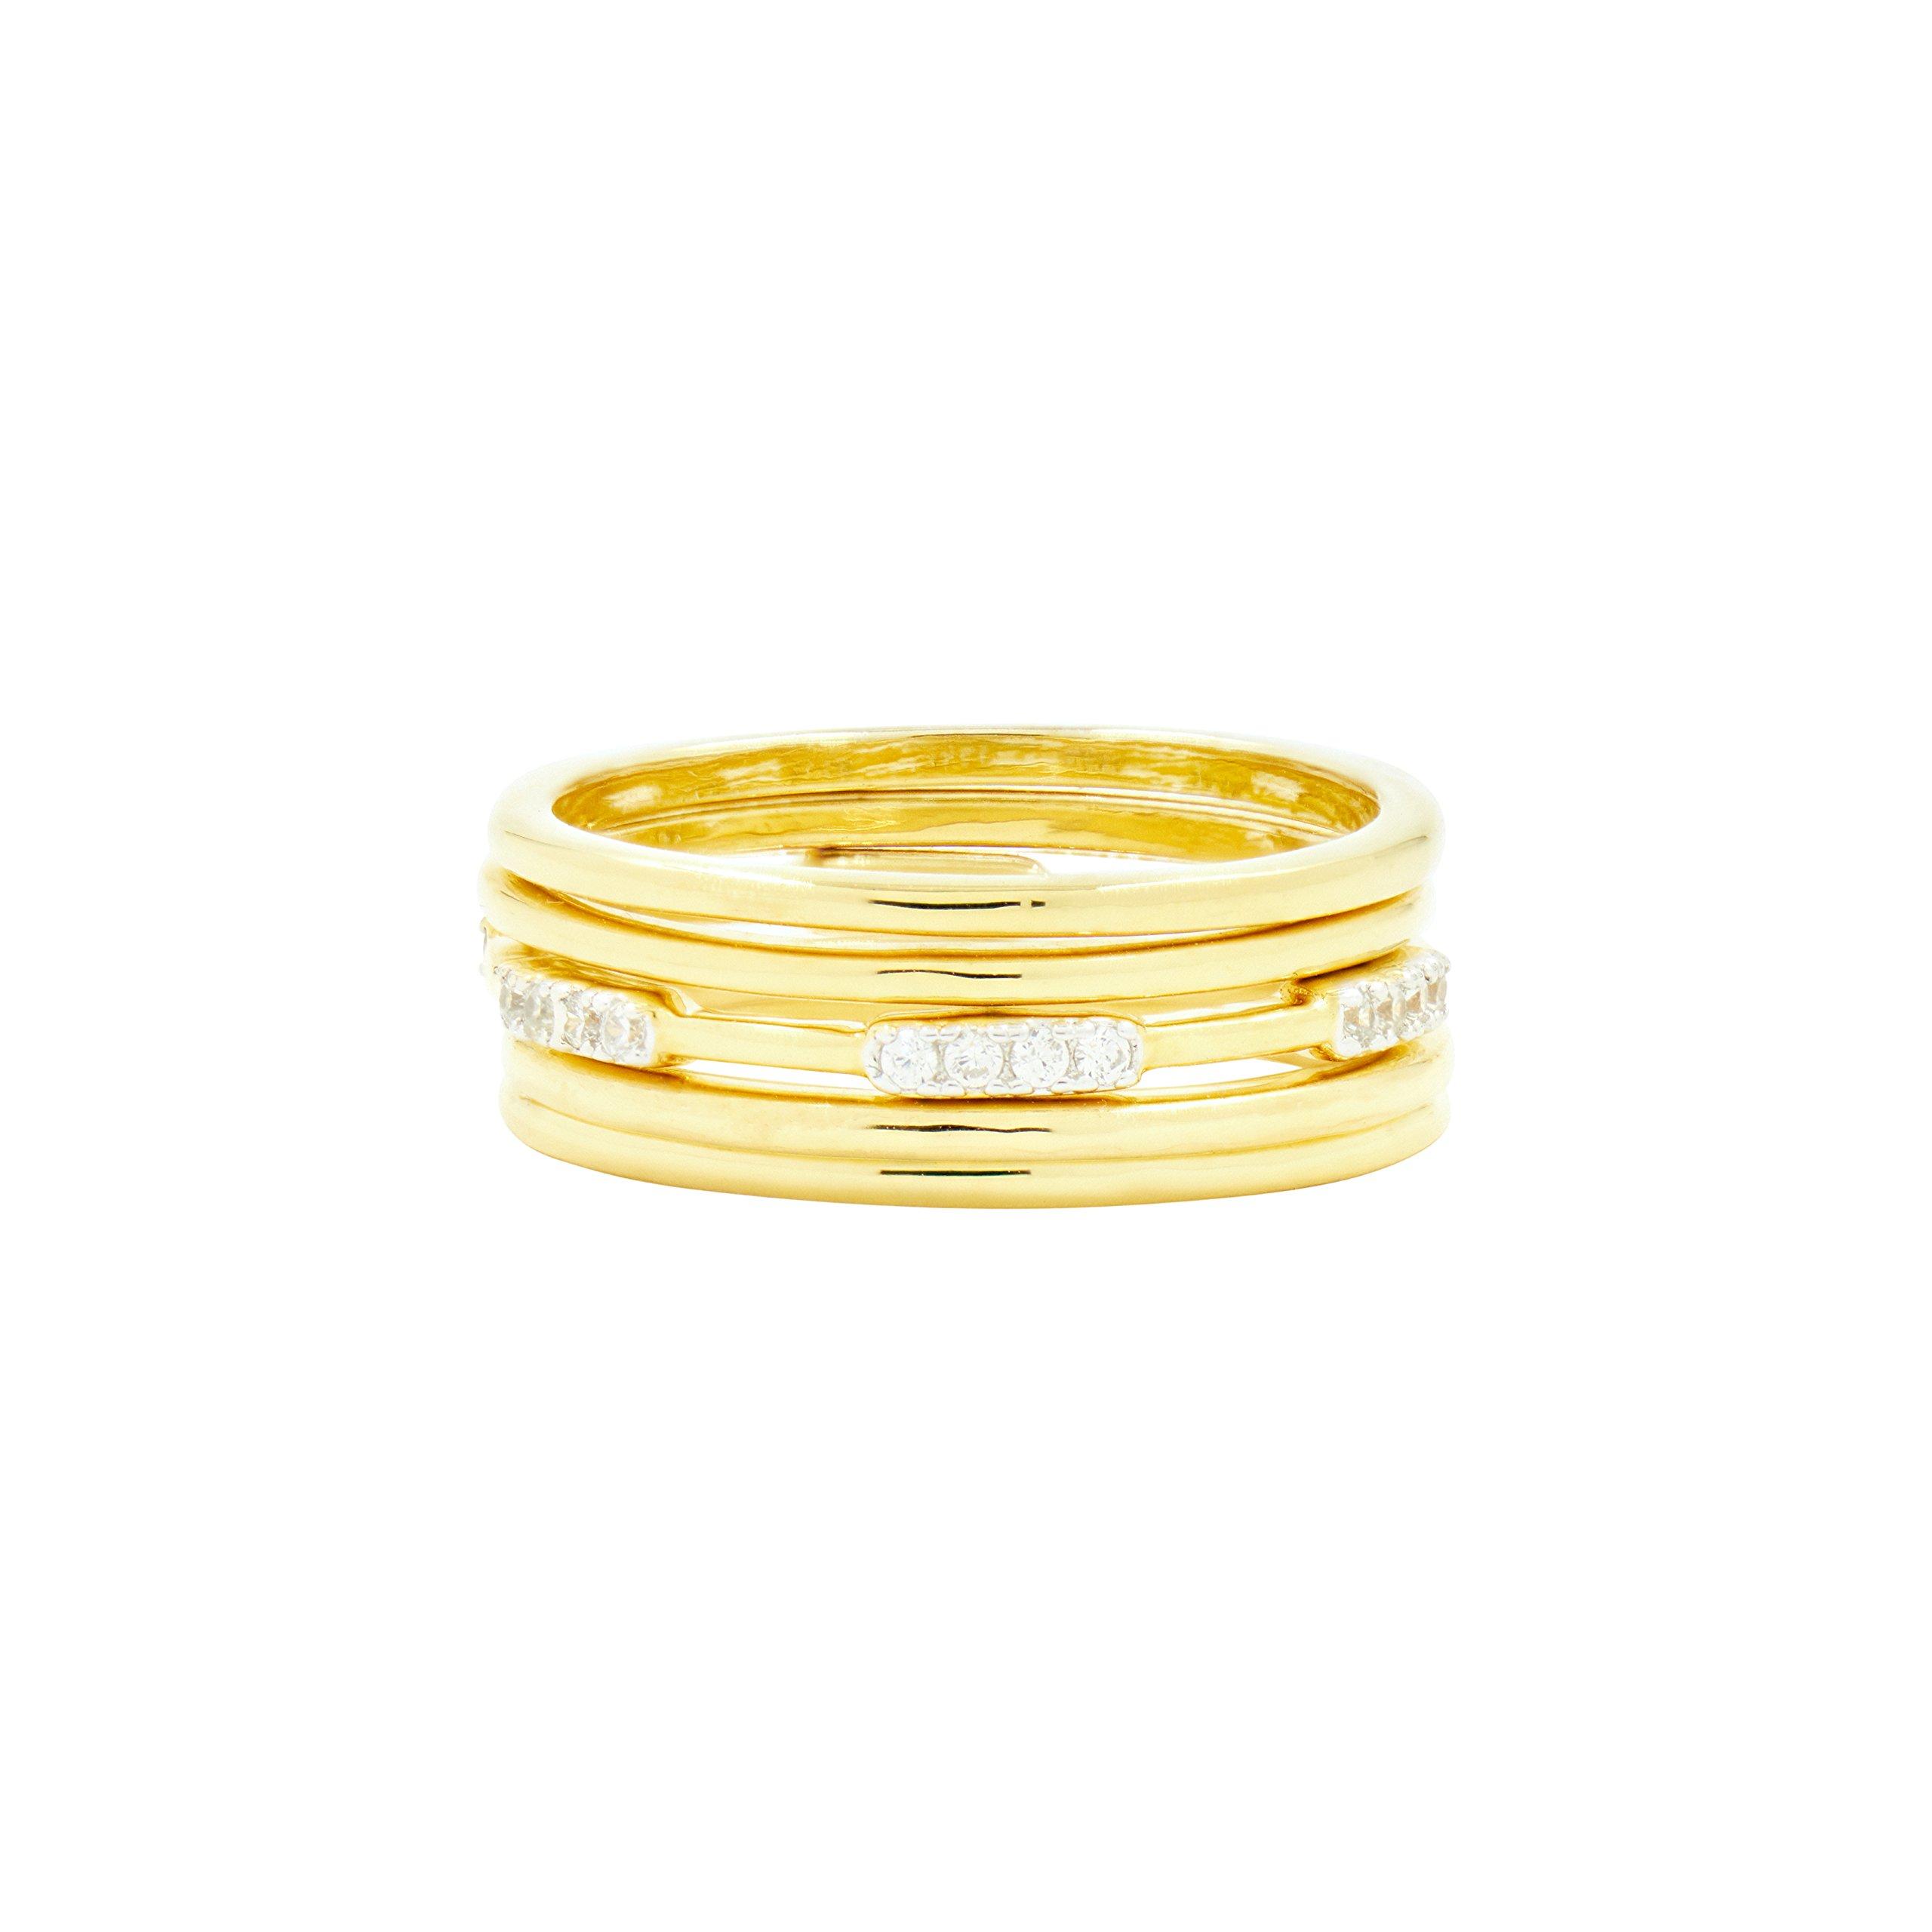 Freida Rothman Women's Radiance 5-Stack Ring, Silver/Gold, 8